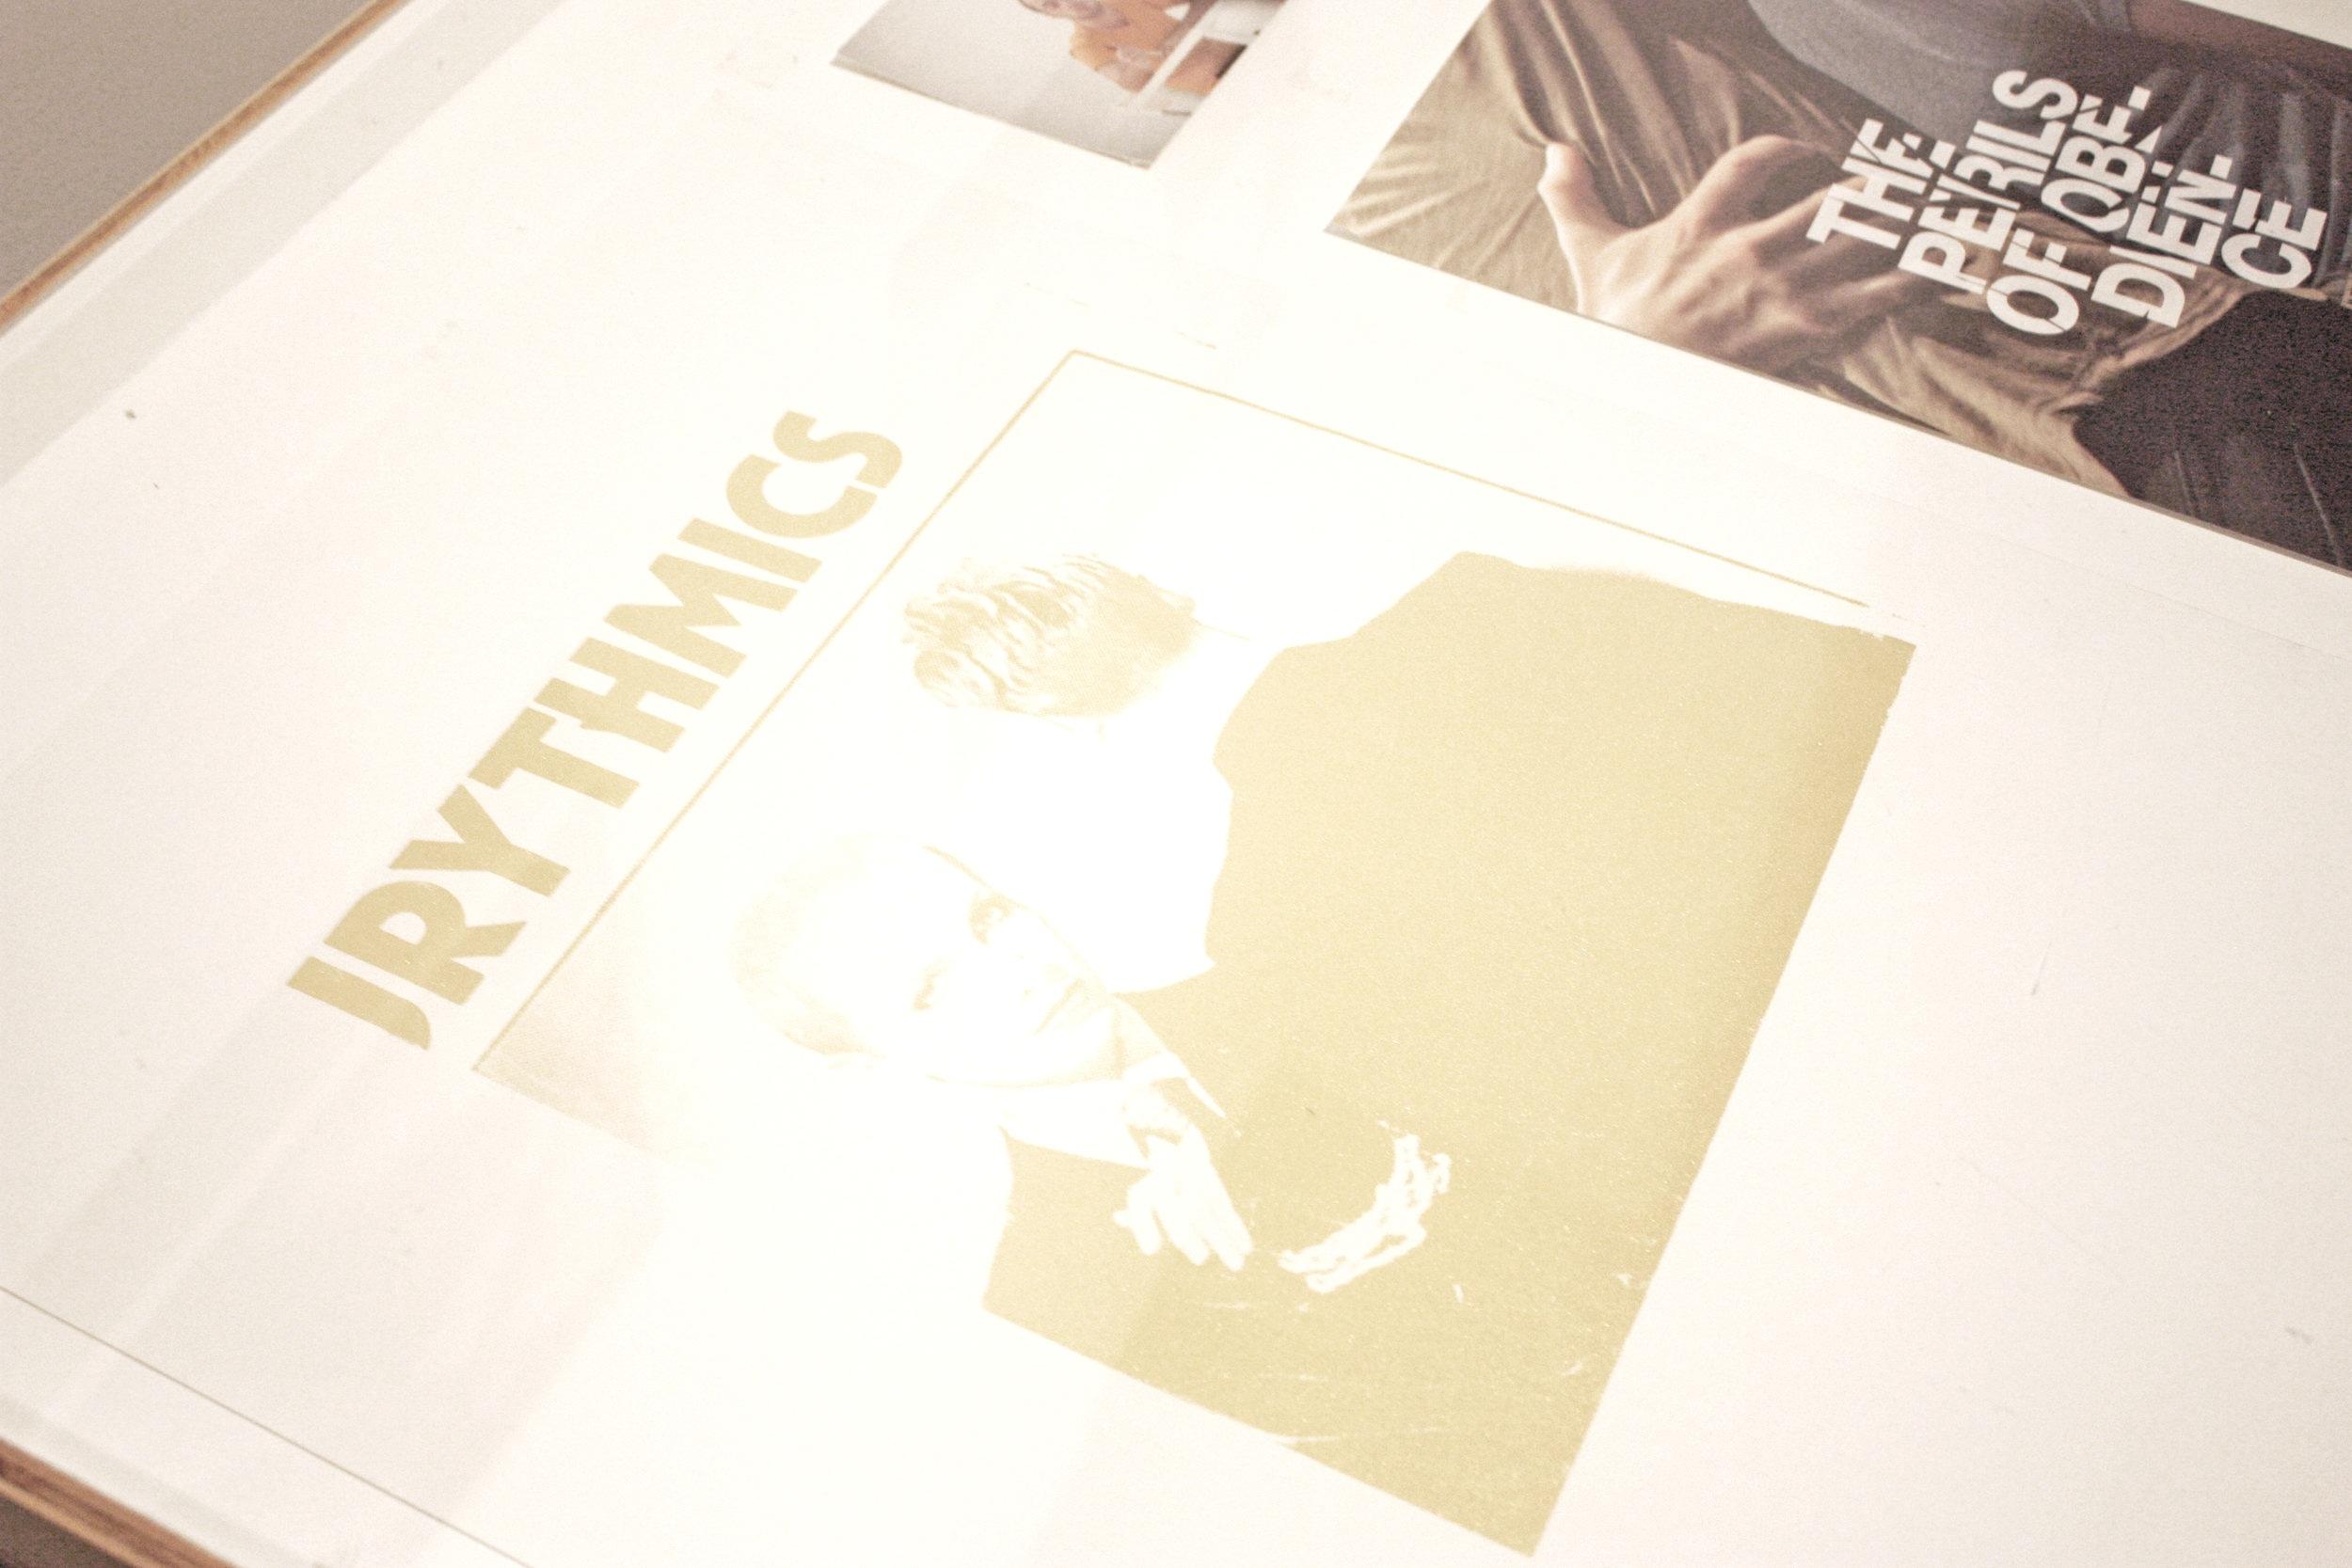 EURYTHMICS  Silkscreen on paper  57 x 38 cm  2017